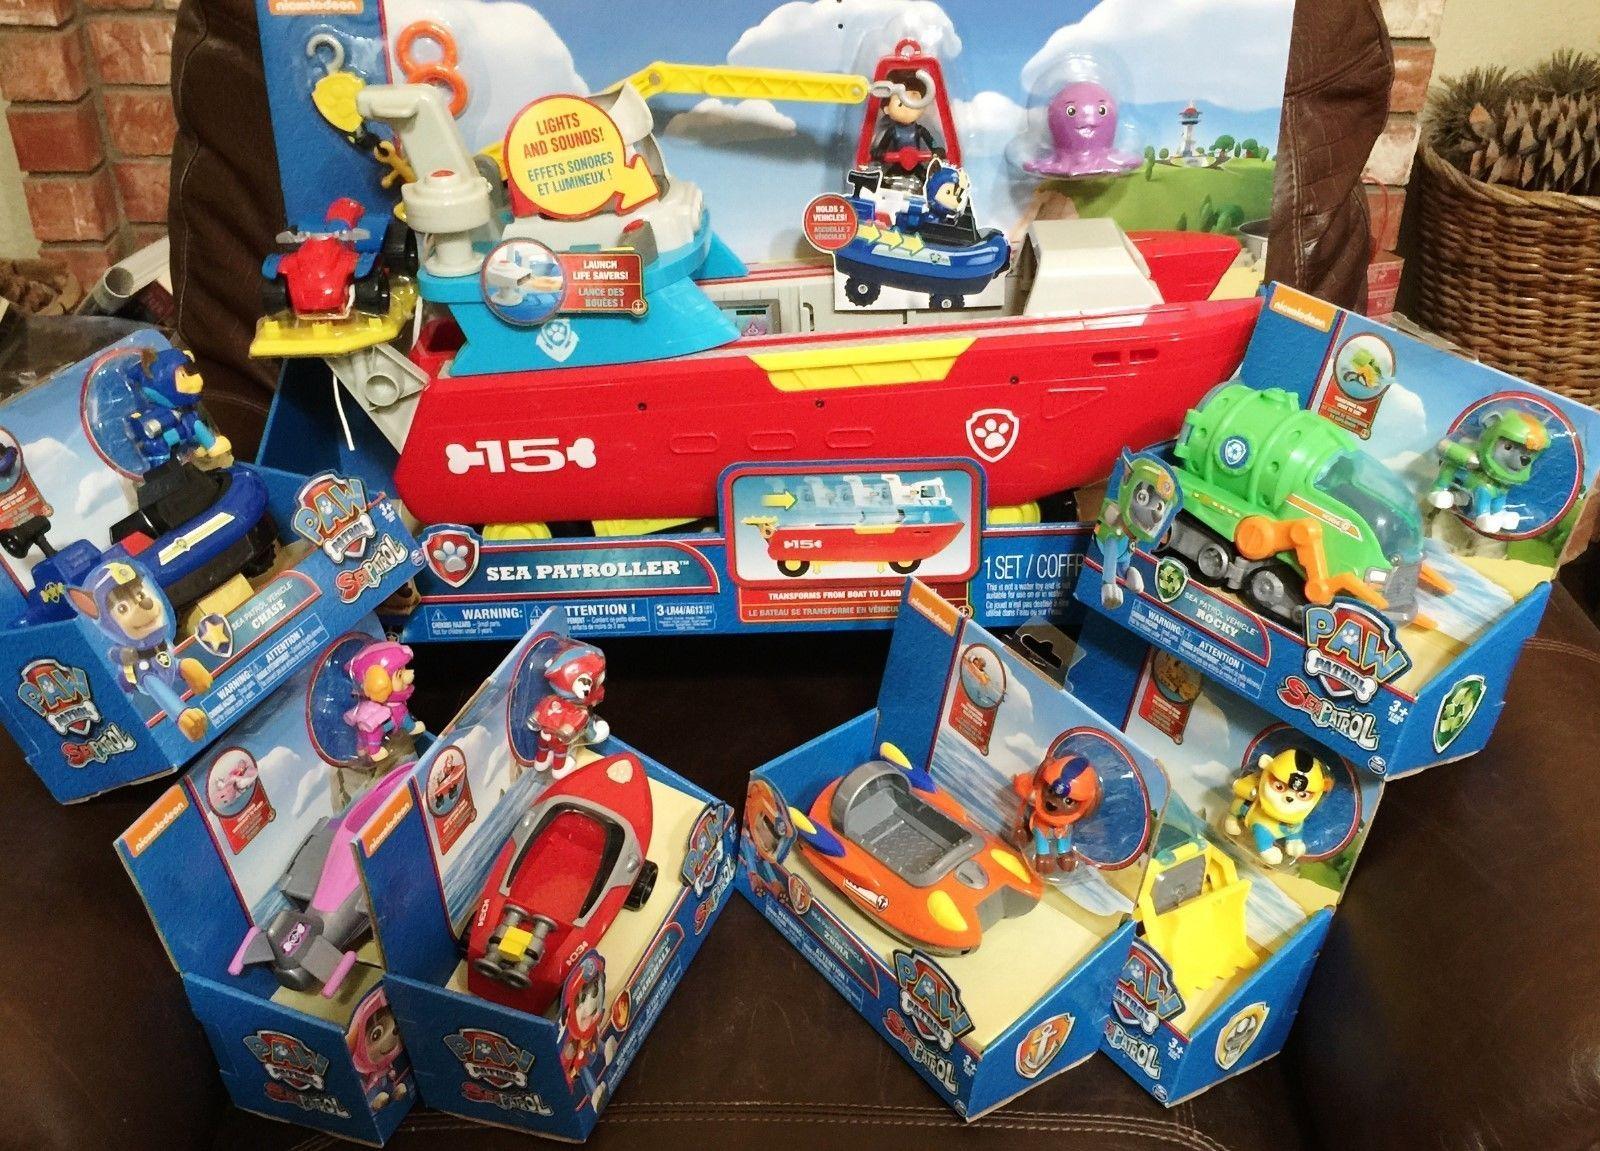 Quatang Gallery- Paw Patrol Sea Patroller W 6 Vehicle Playsets Complete Set Transporter Boat Paw Patrol Paw Patrol Toys Playset